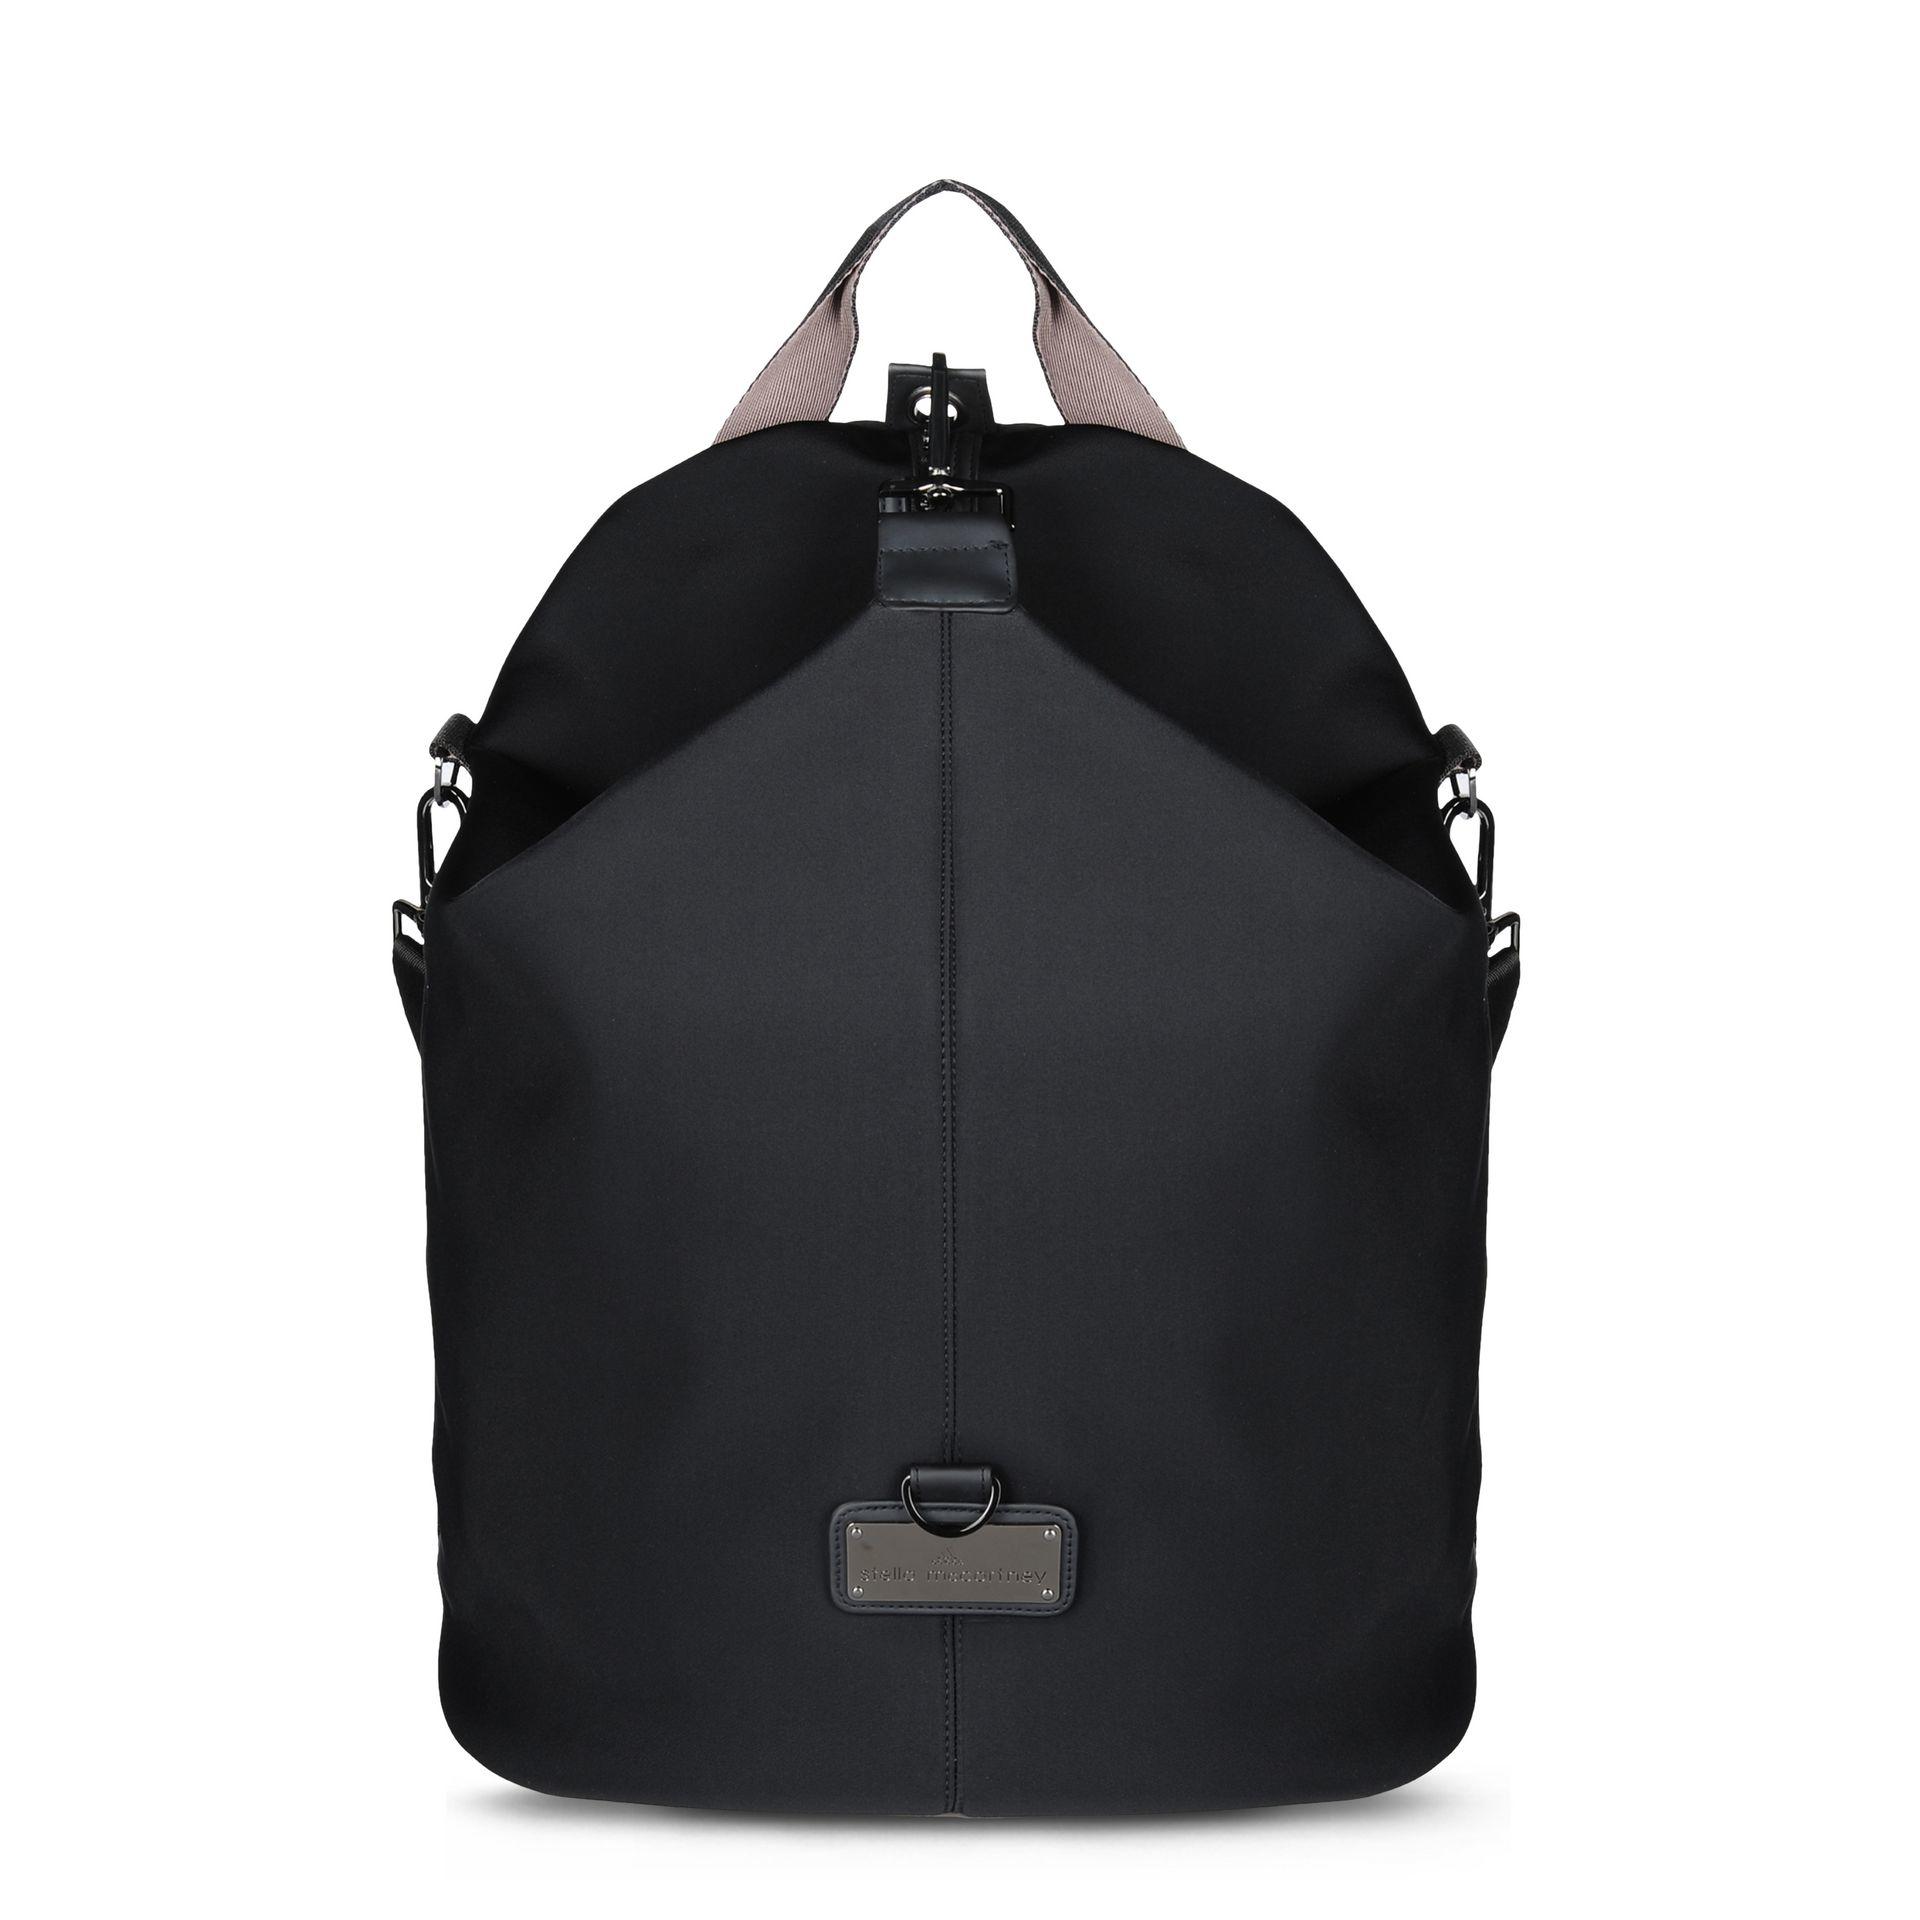 Lyst - adidas By Stella McCartney Studio Neoprene Backpack in Black 60ea7c3156ebf